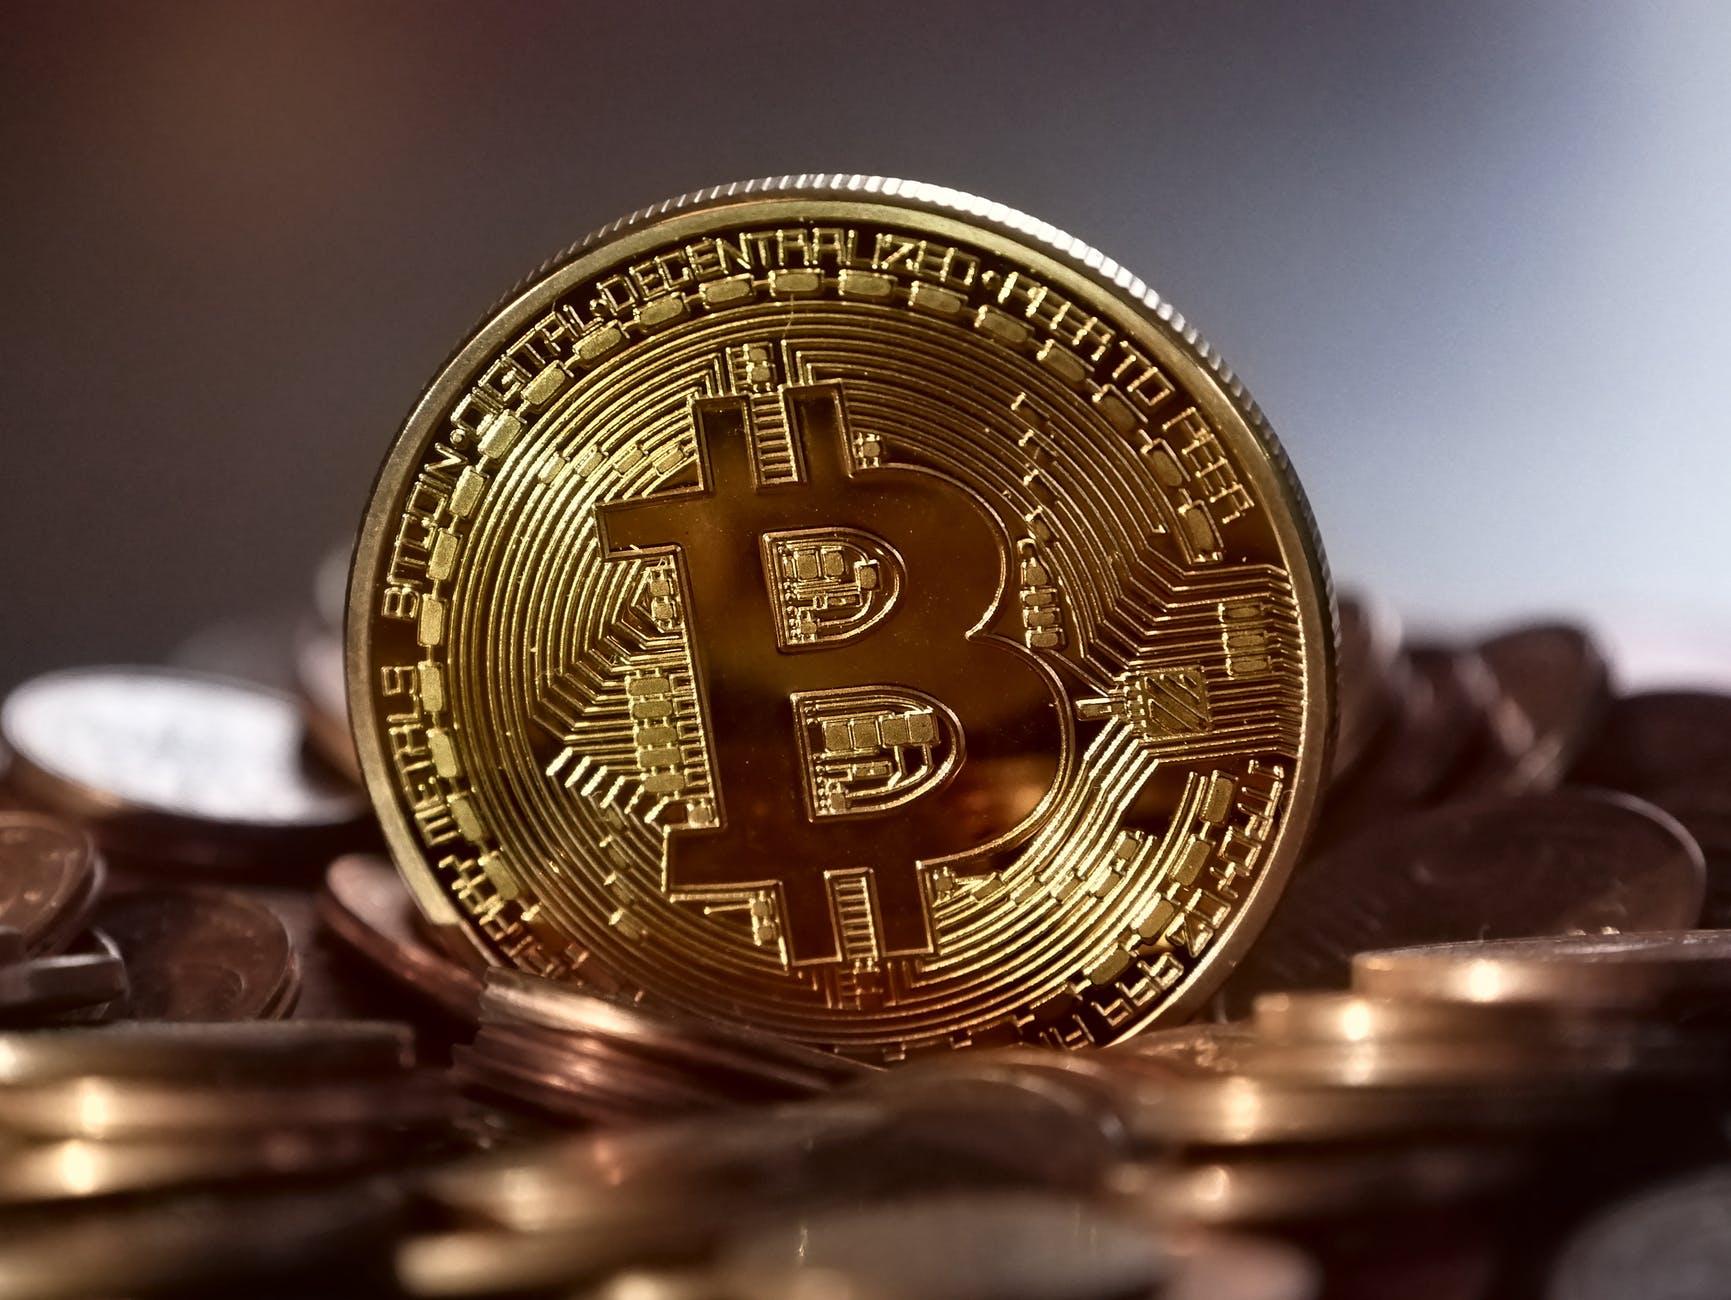 Bora minerar bitcoin a longo prazo